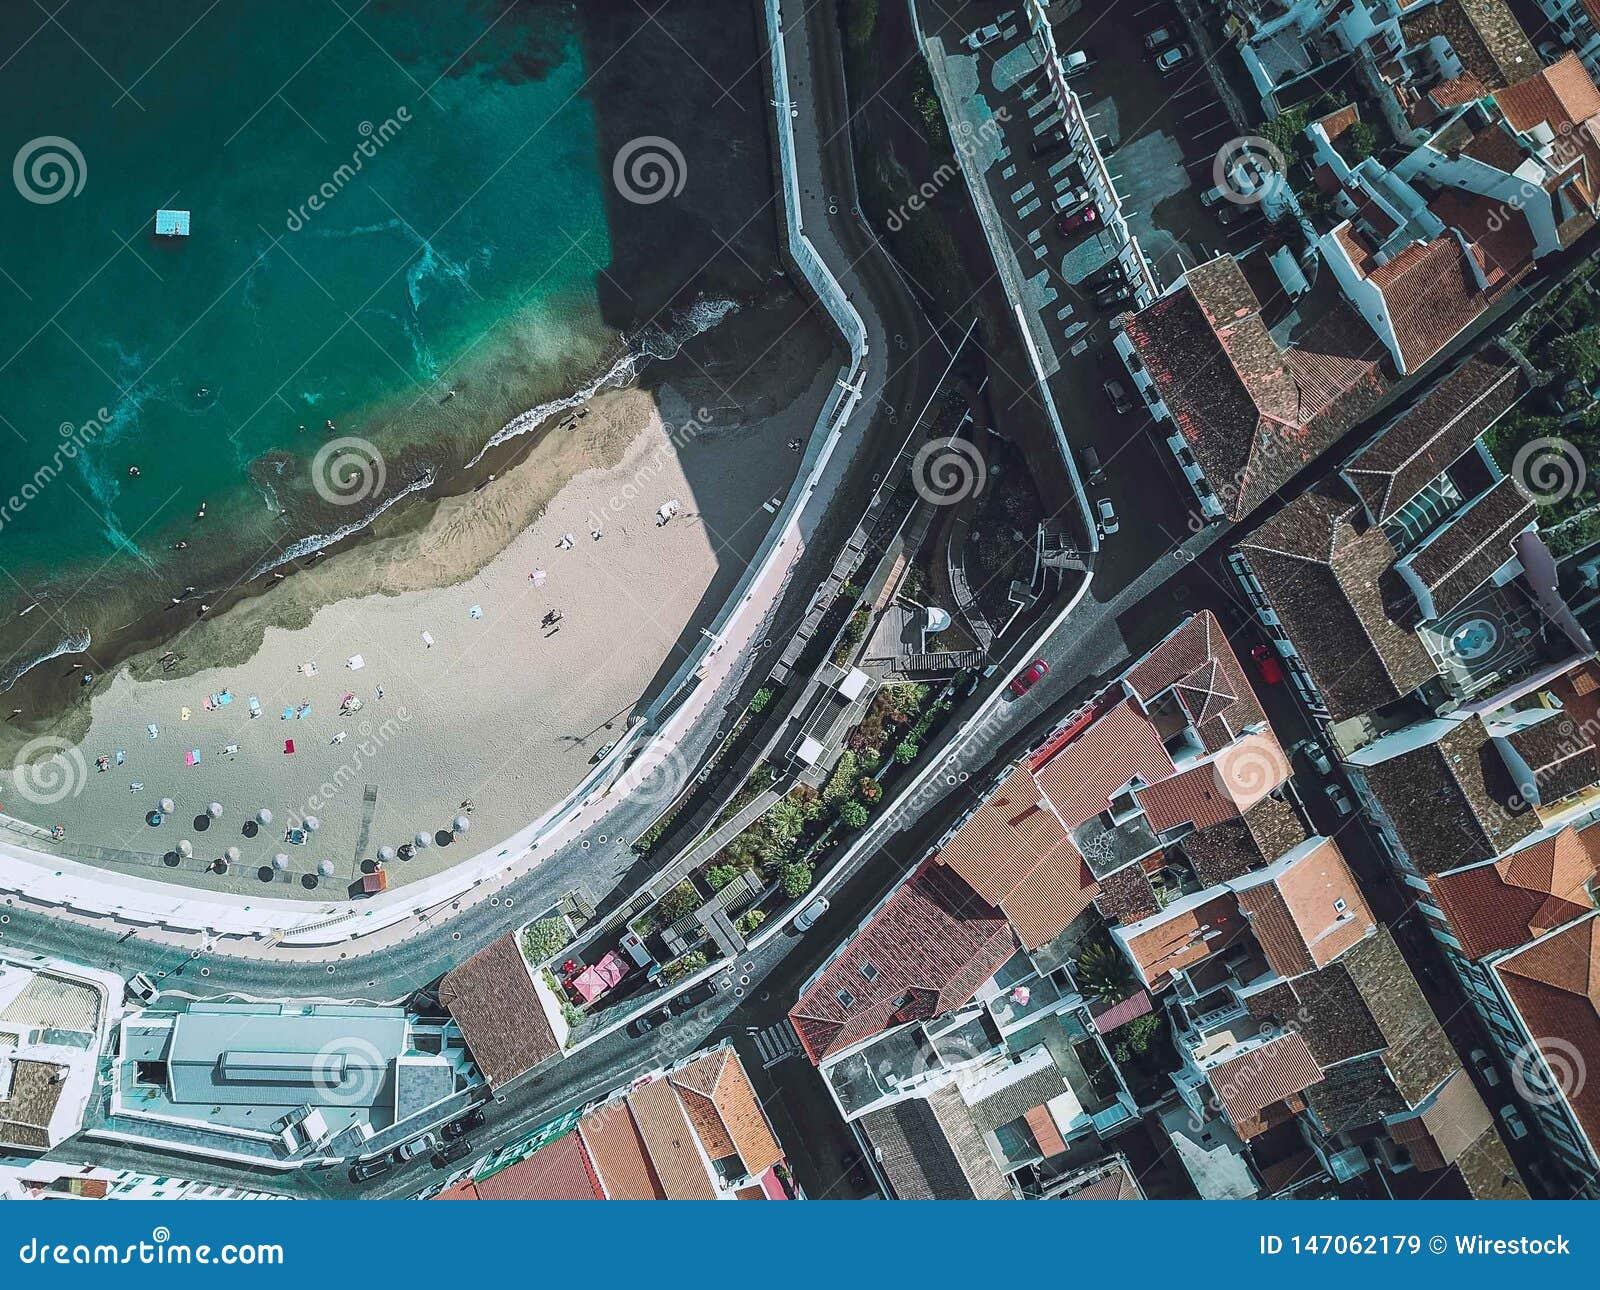 Aerial shot of the beach of an urban city